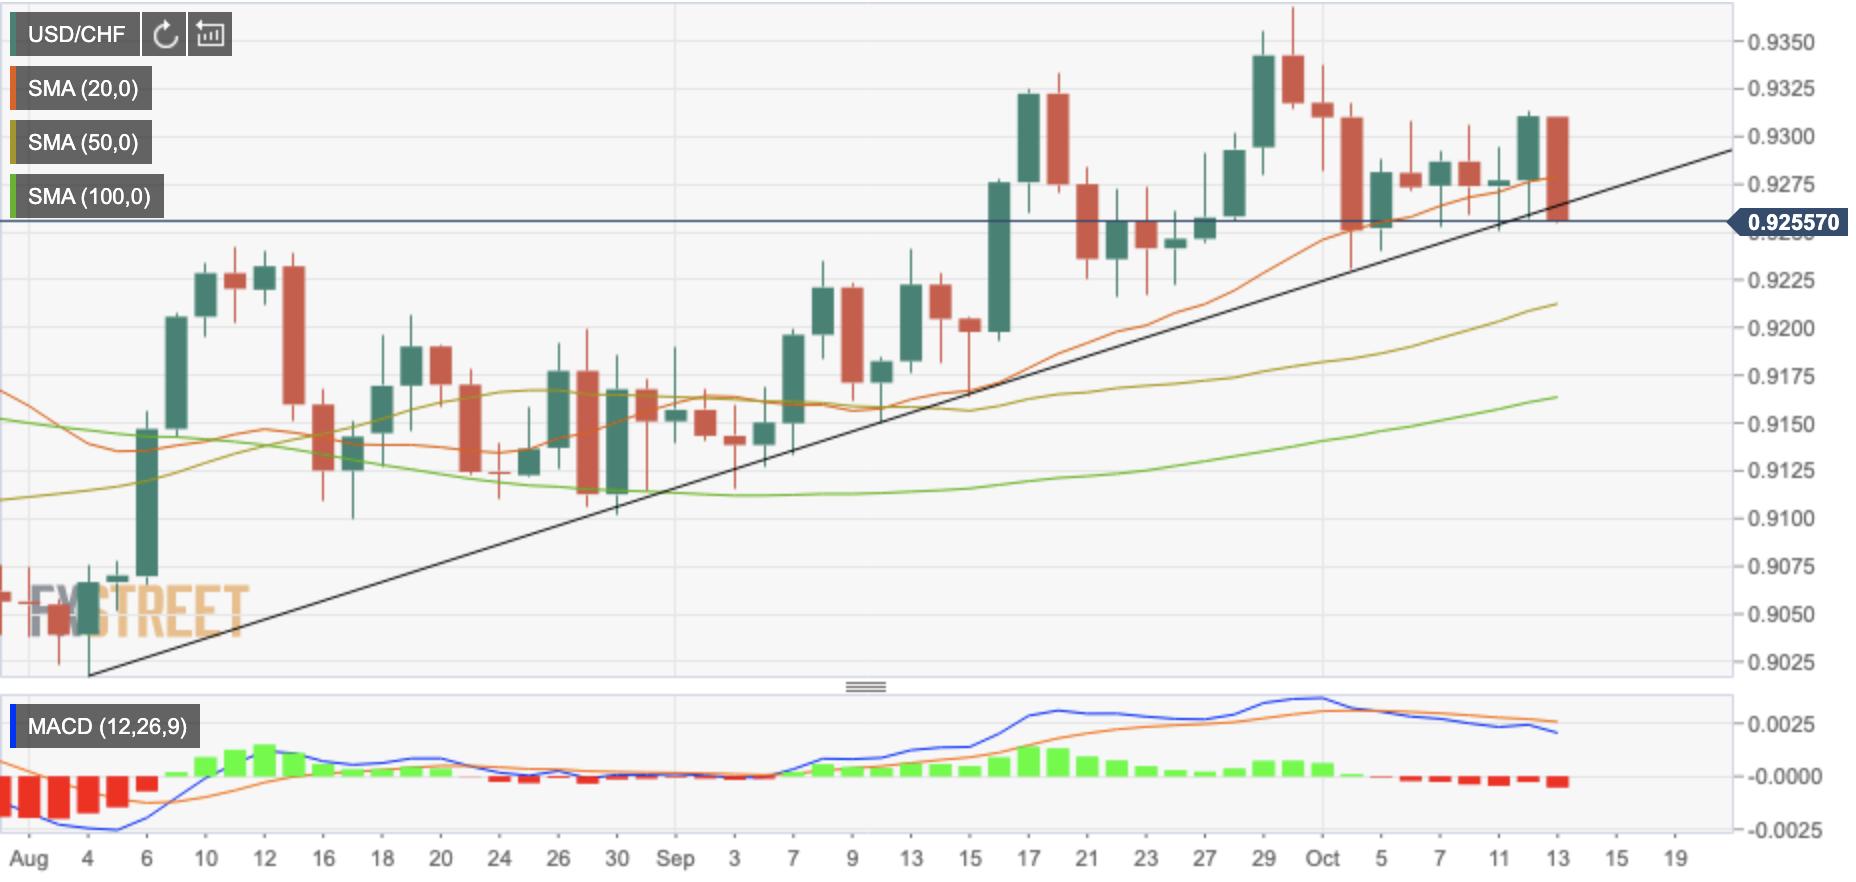 USD/CHF: тестирует поддержку линии тренда на 0.9265